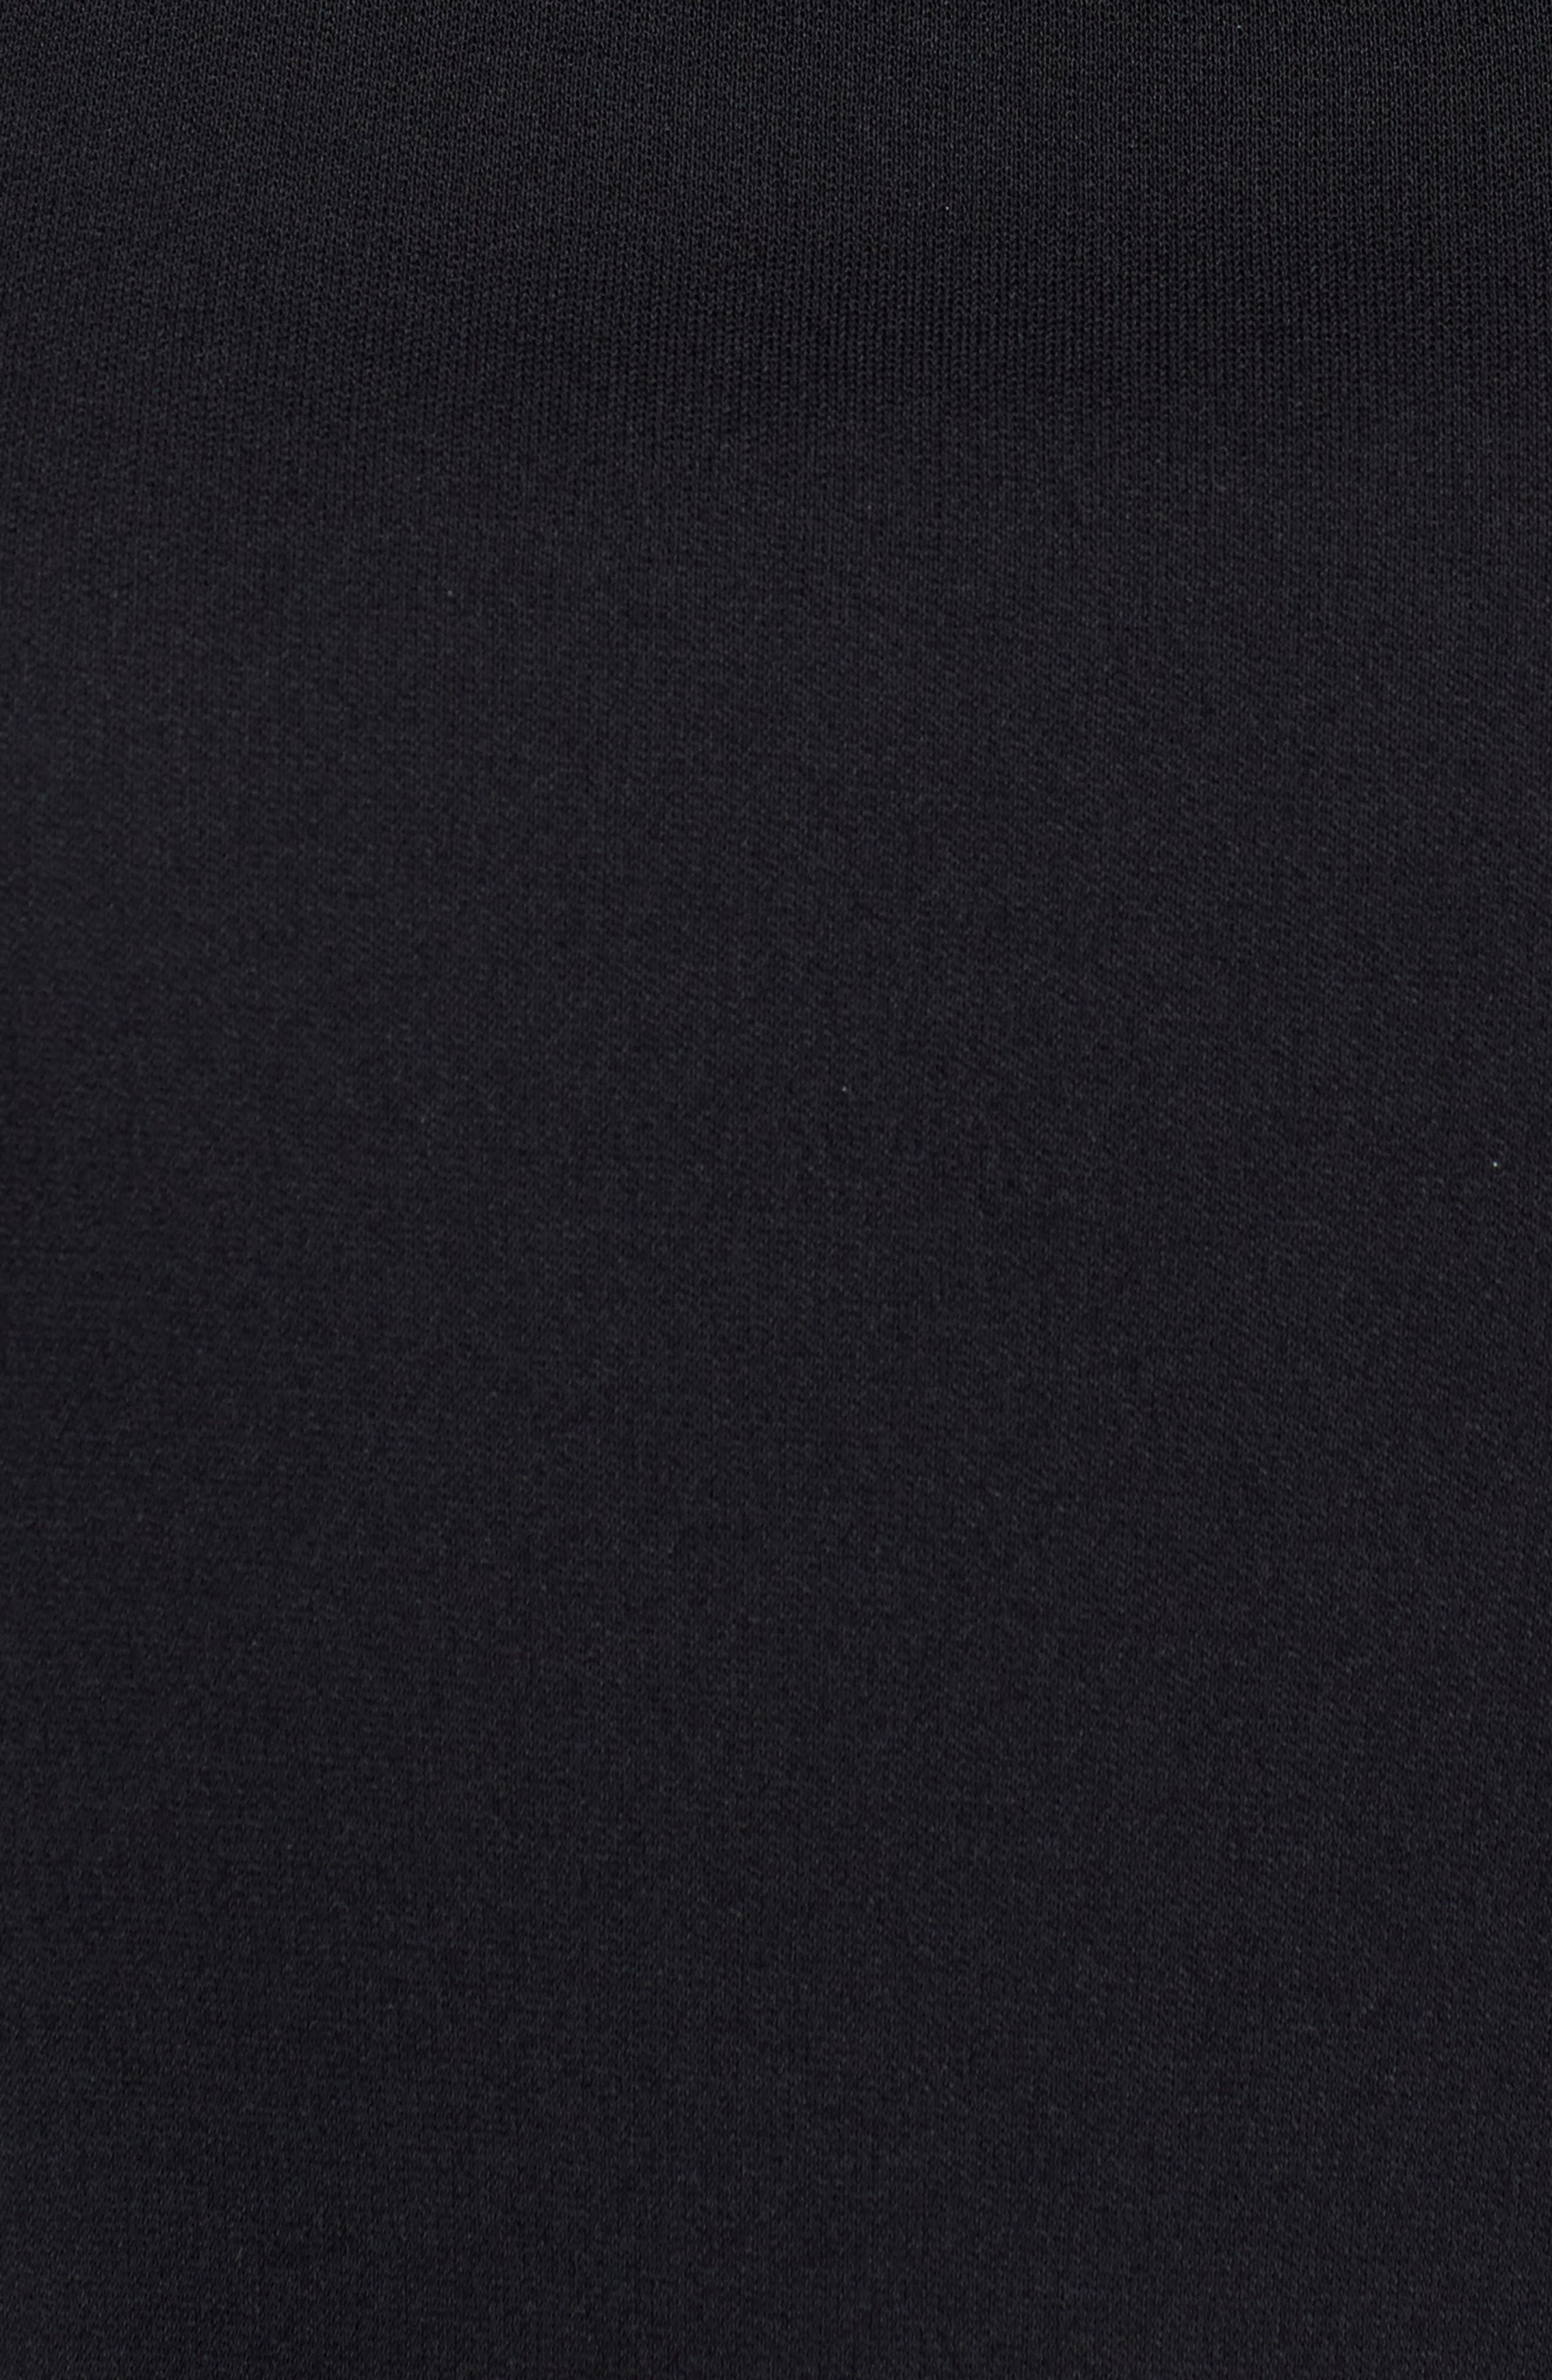 VINCE CAMUTO,                             Sheer Yoke Shift Dress,                             Alternate thumbnail 5, color,                             001